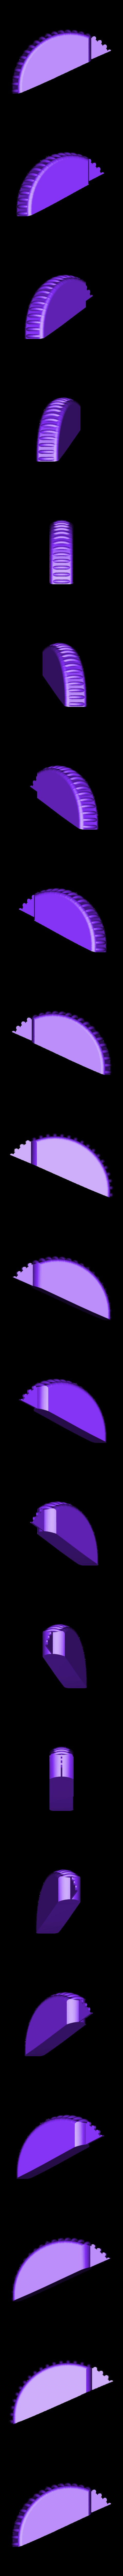 V4_mouse_wheel.STL Download free STL file Multi-Color Computer Mouse Model: Industrial/Product Design • 3D printable model, MosaicManufacturing